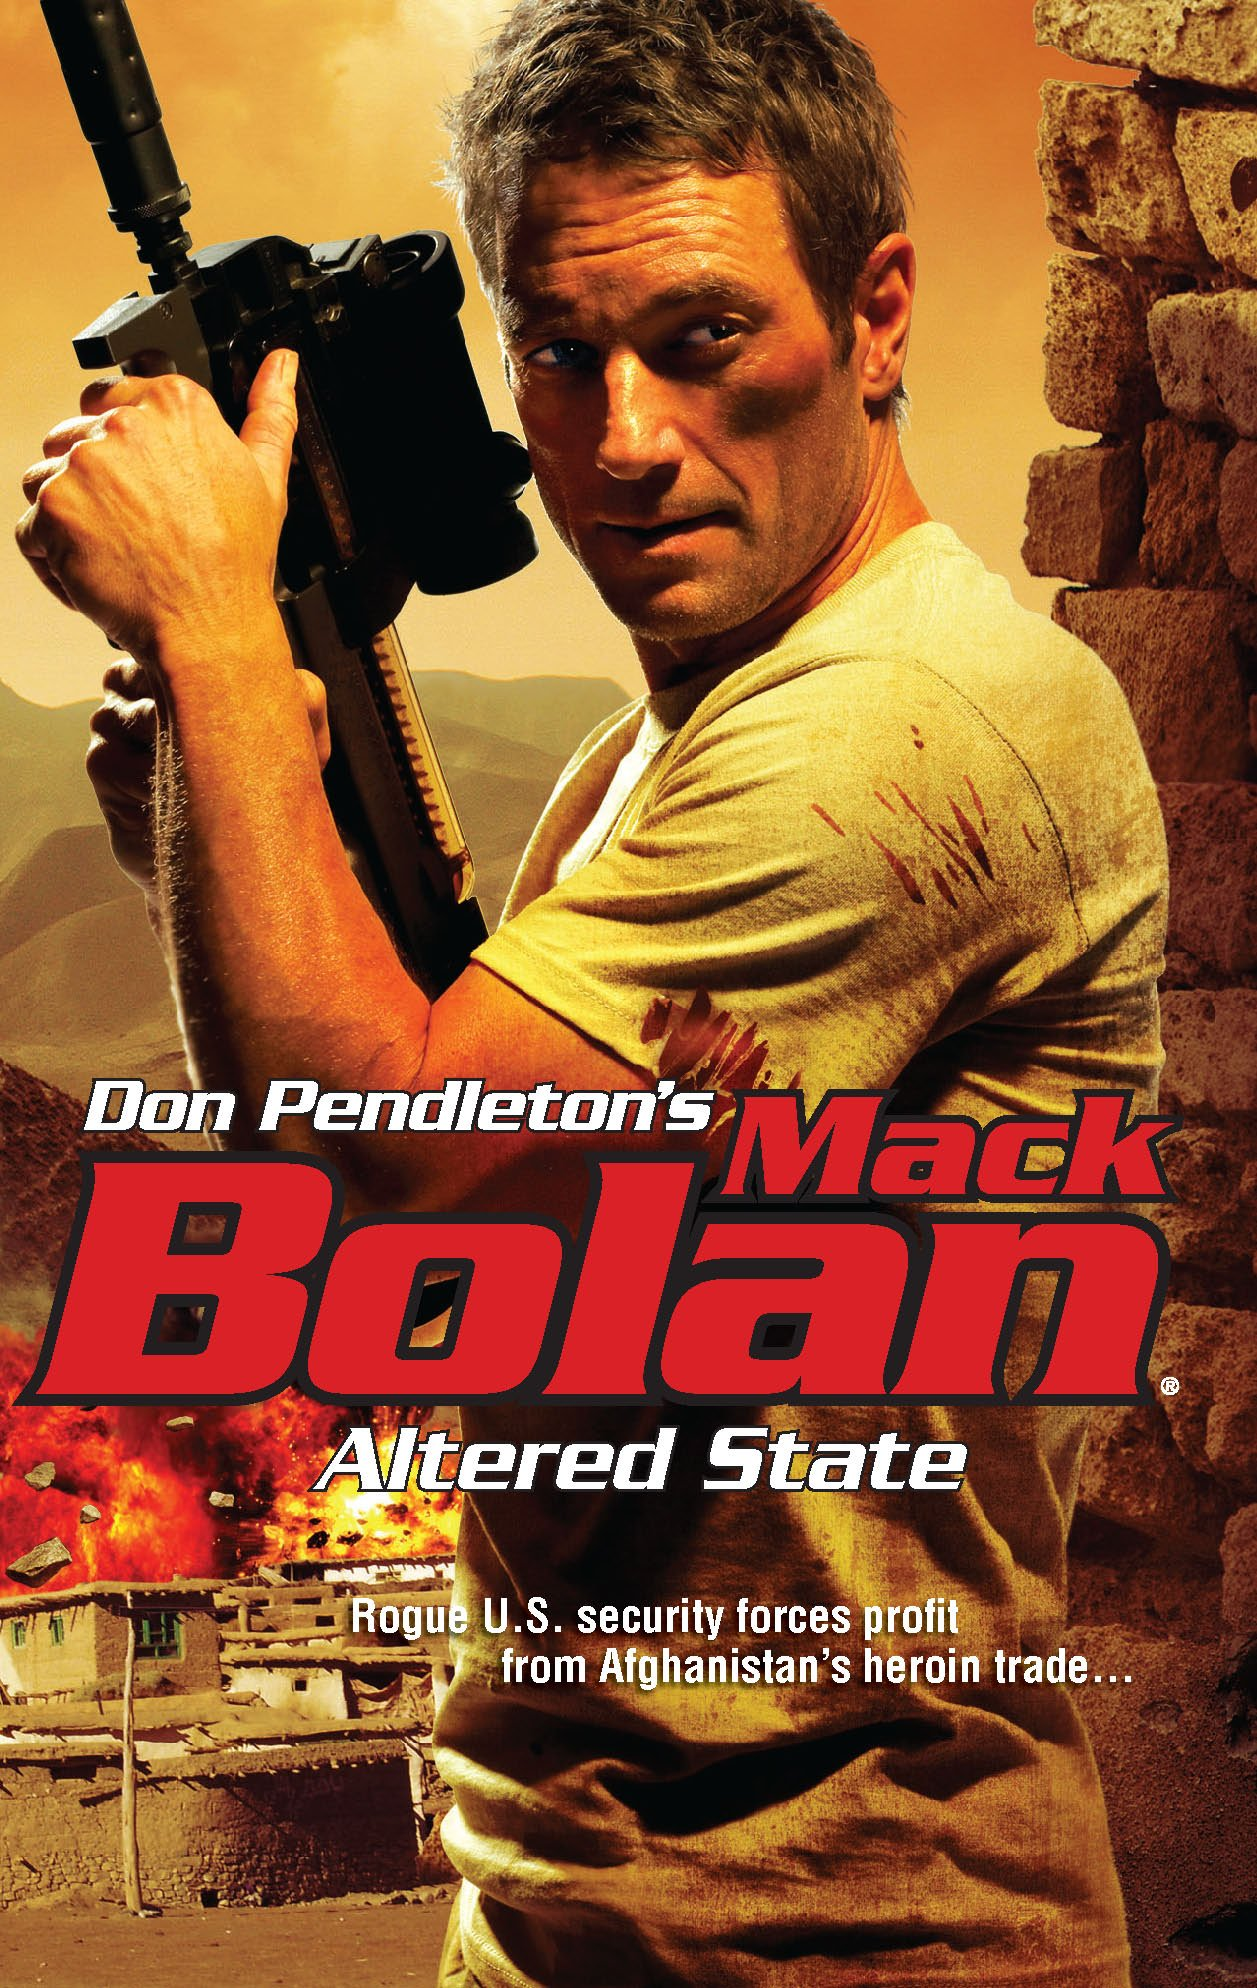 Altered State (Mack Bolan): Don Pendleton: 9780373615322: Amazon.com: Books